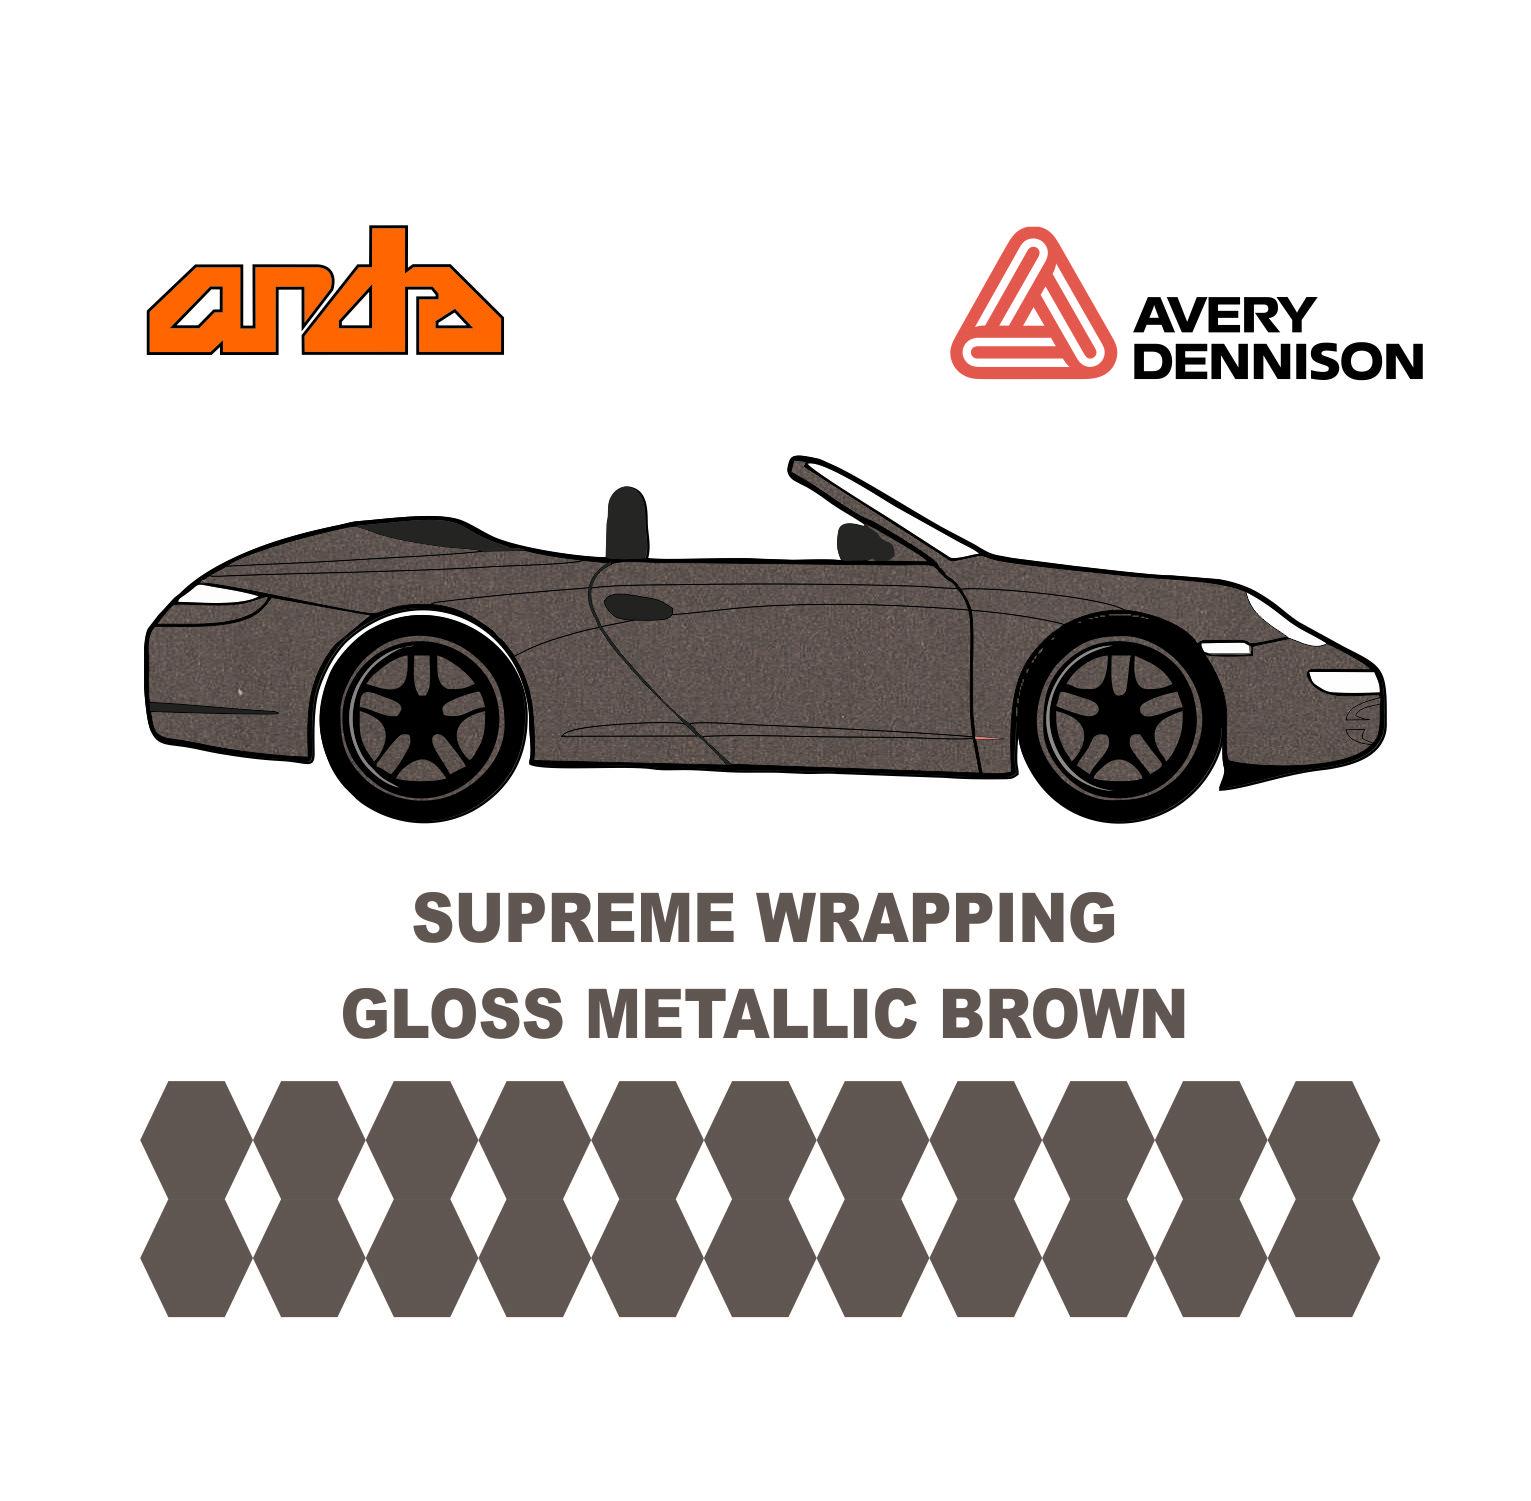 Avery Dennison- SWF Gloss Metallic Brown 1